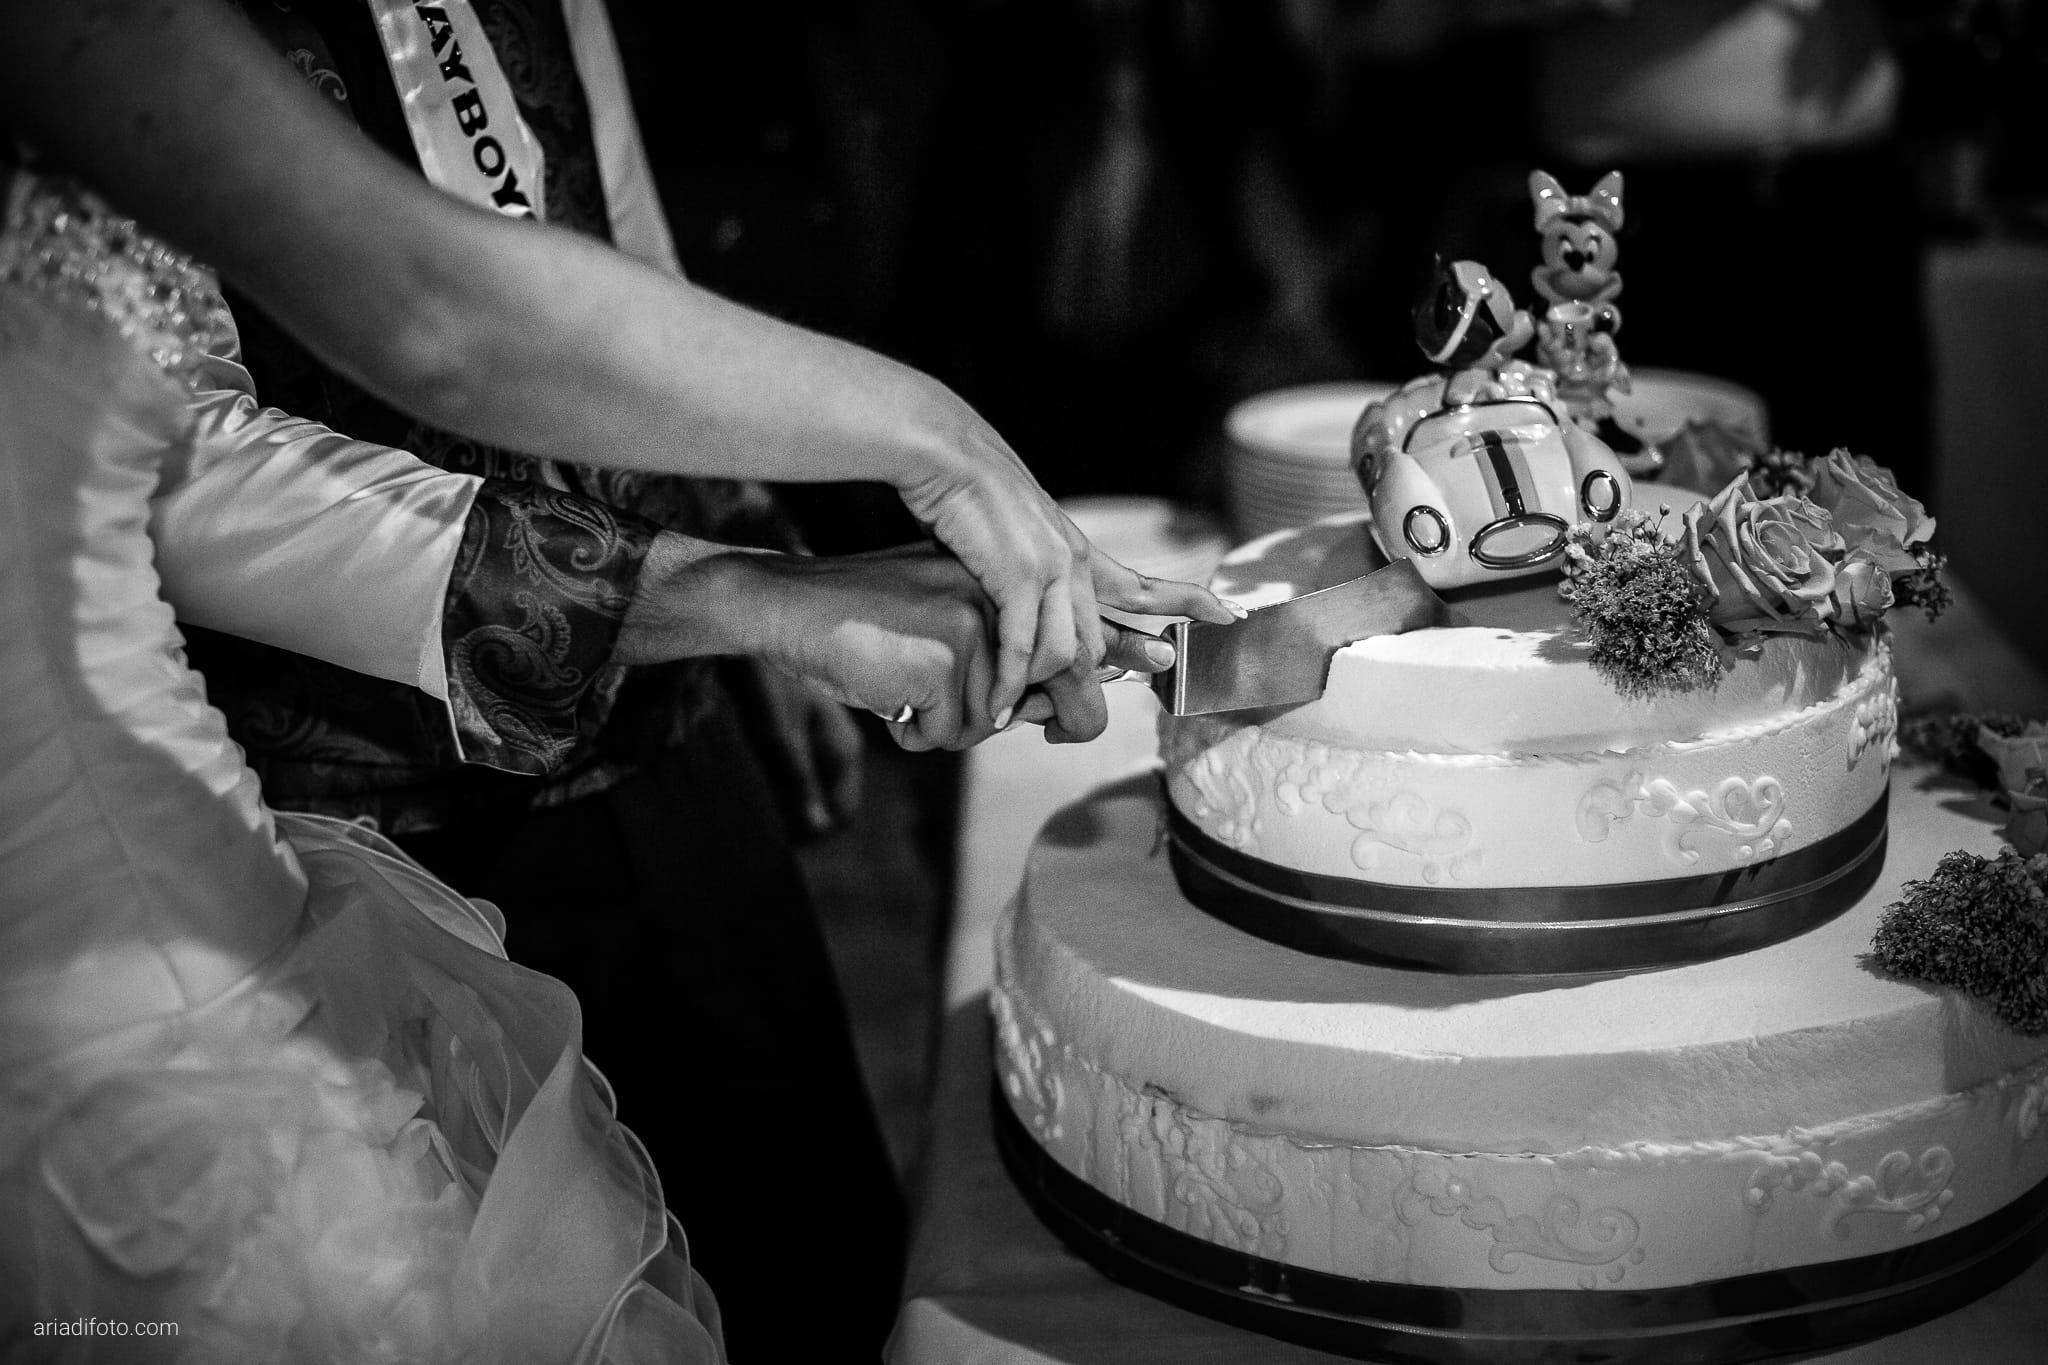 Melania Davide Matrimonio Monrupino Tavernetta Castello di Spessa Capriva Gorizia ricevimento torta